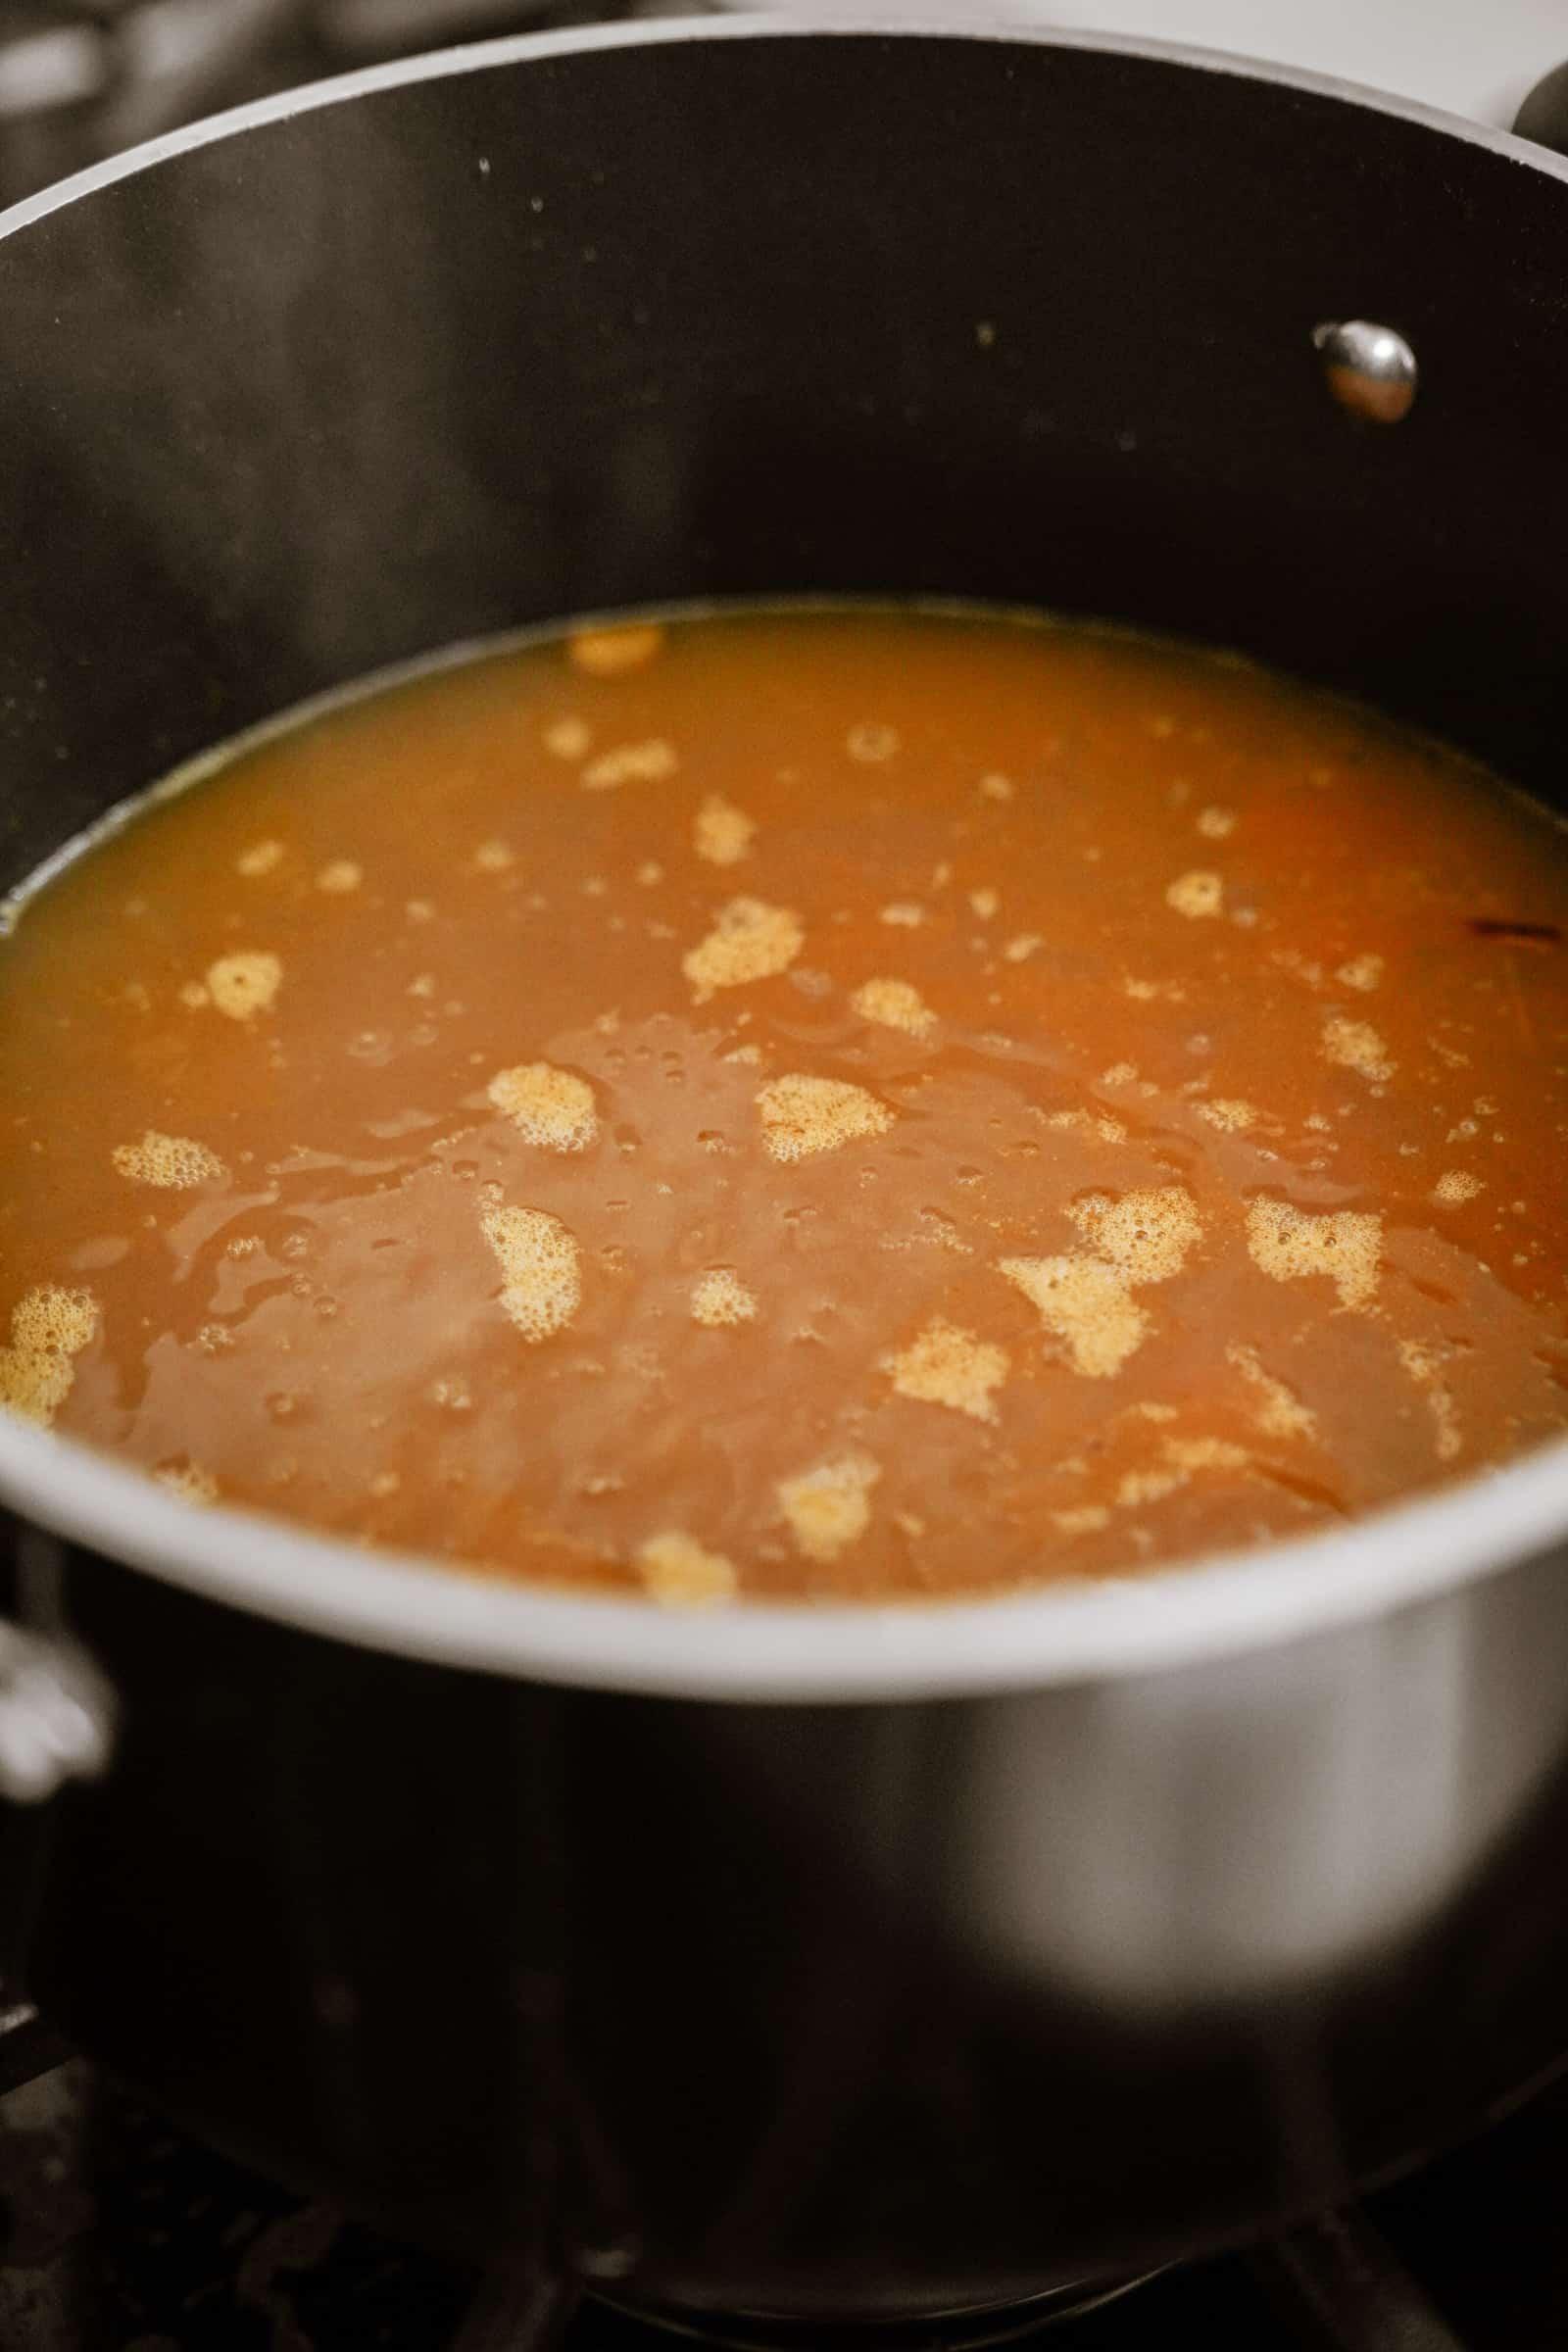 Lemon rice soup cooking in a pot